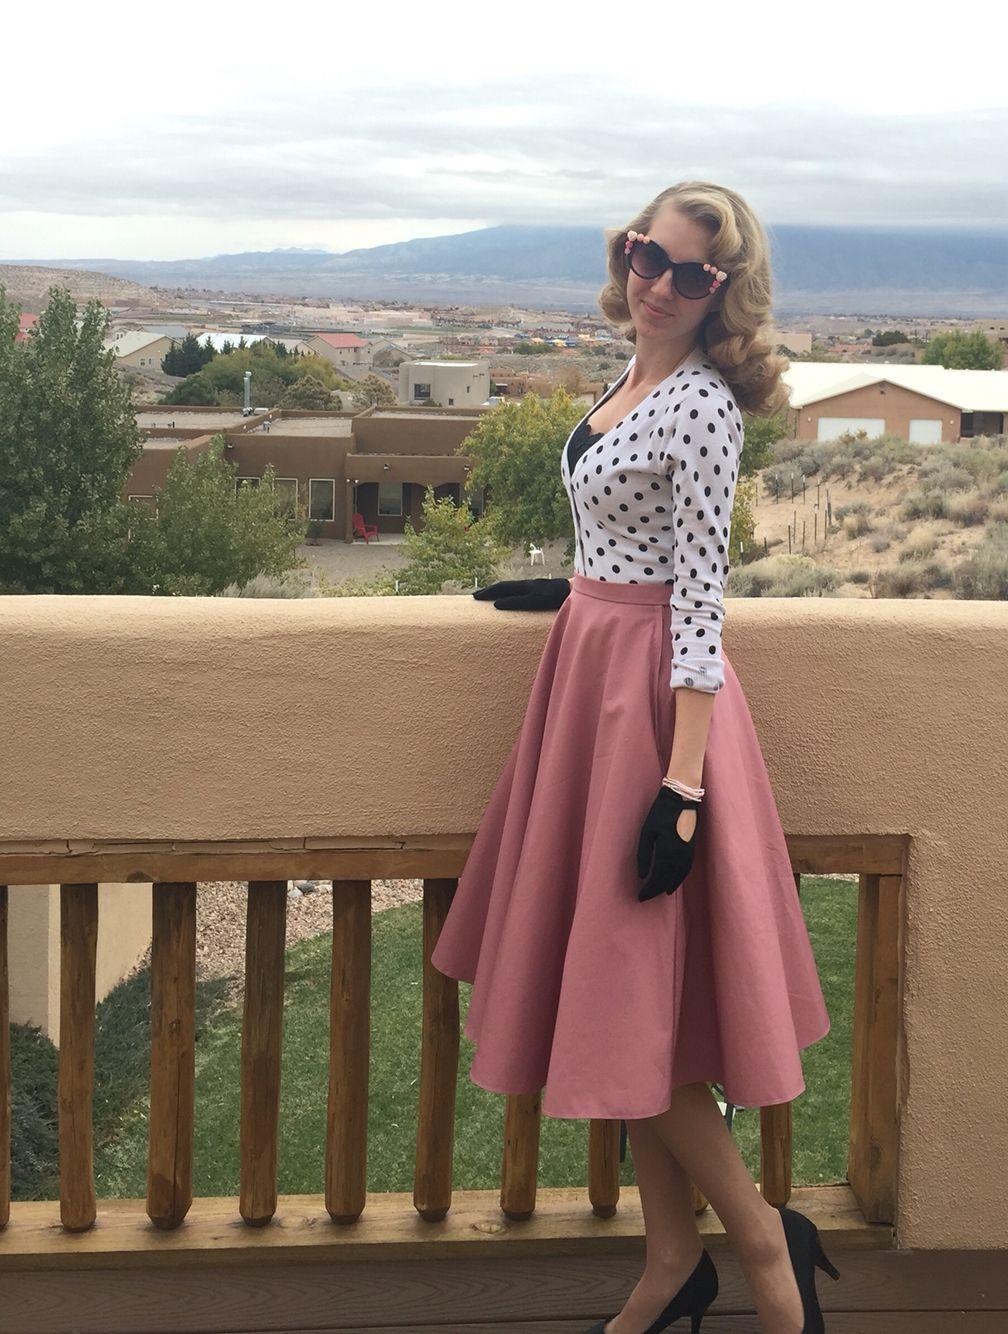 Butterick 5962 - Patterns by Gertie vintage/retro circle skirt Instagram @sewingsiren